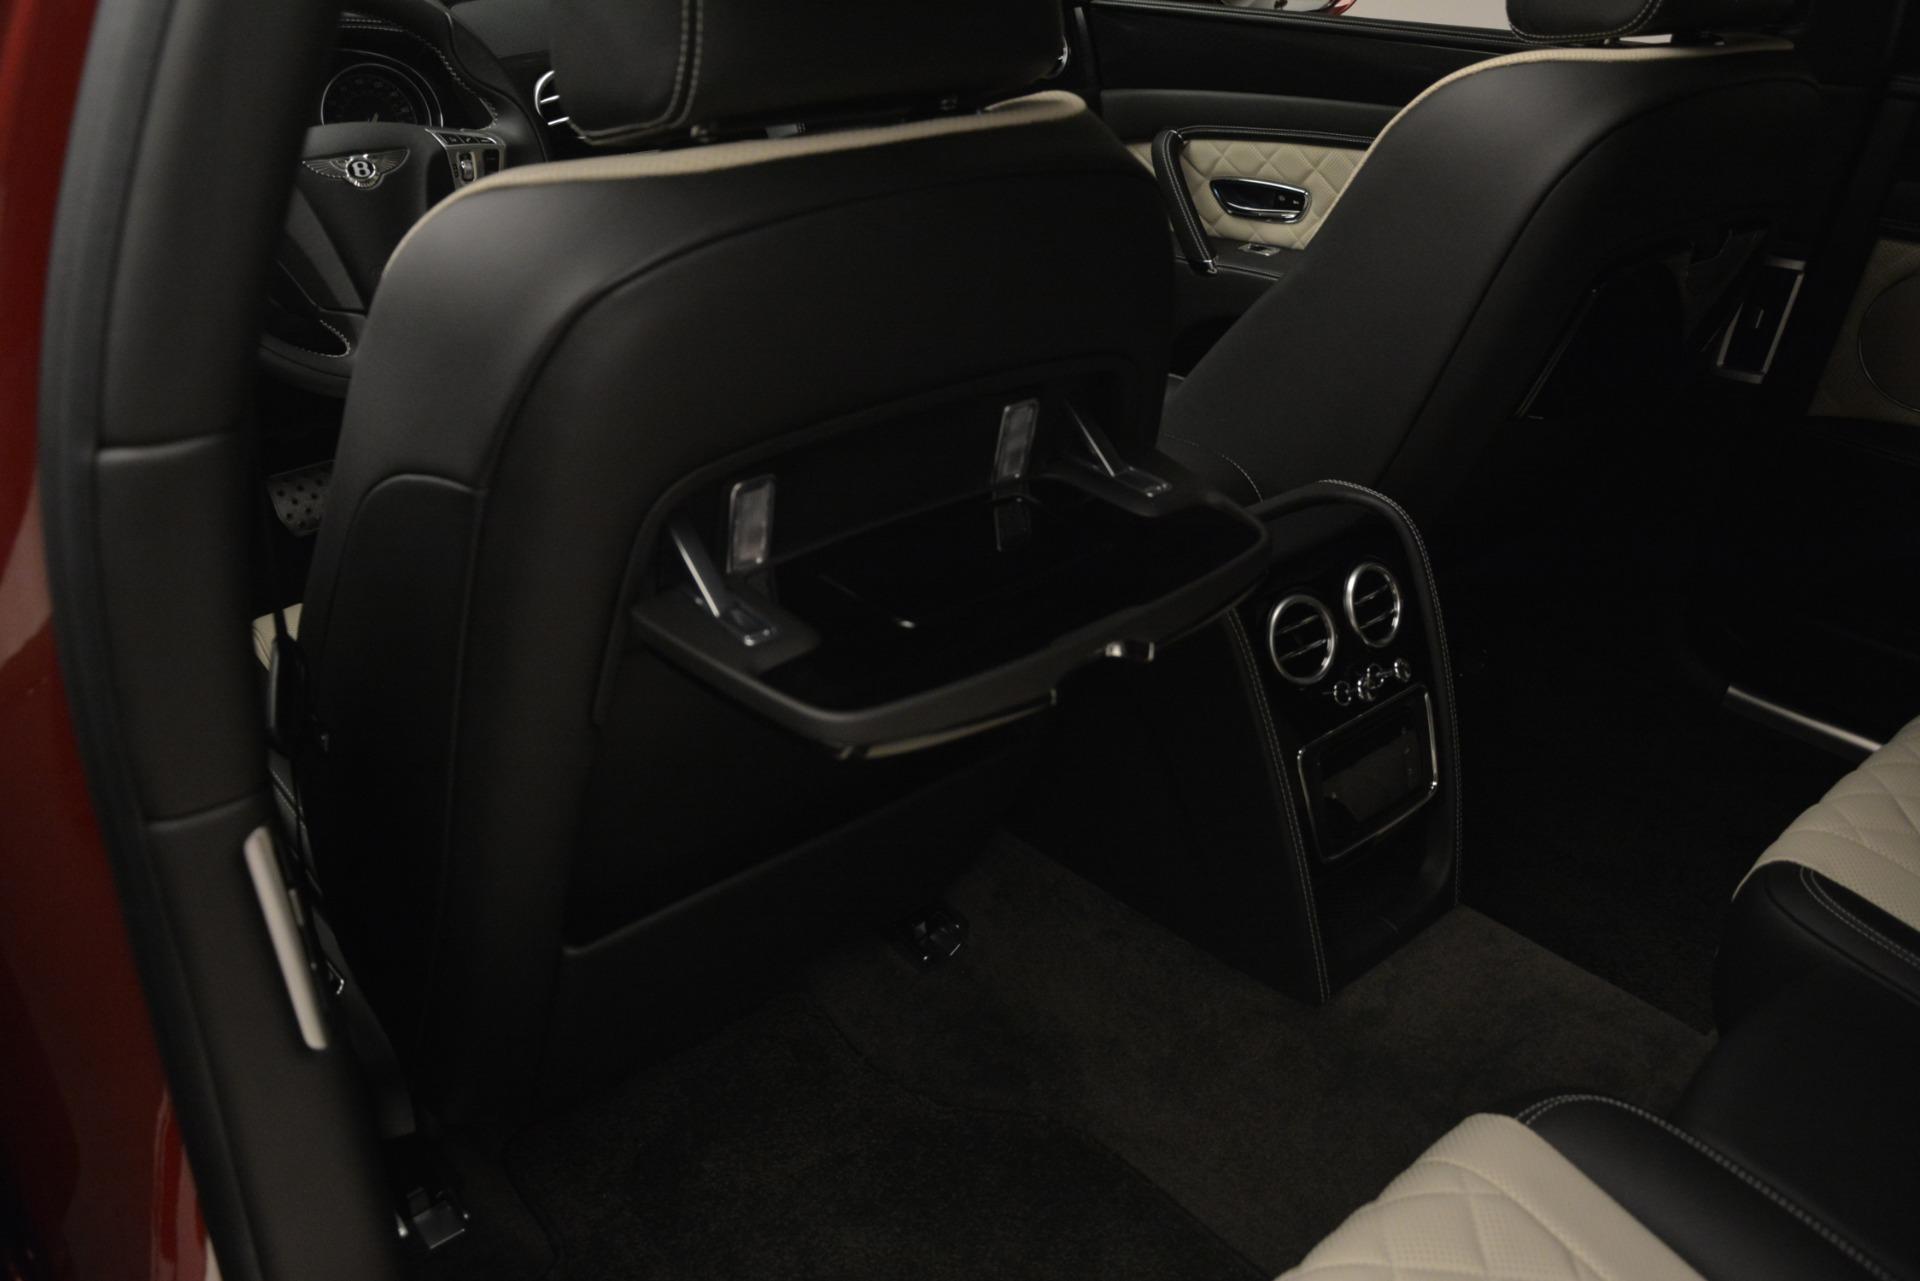 Used 2018 Bentley Flying Spur W12 S For Sale In Westport, CT 3014_p25